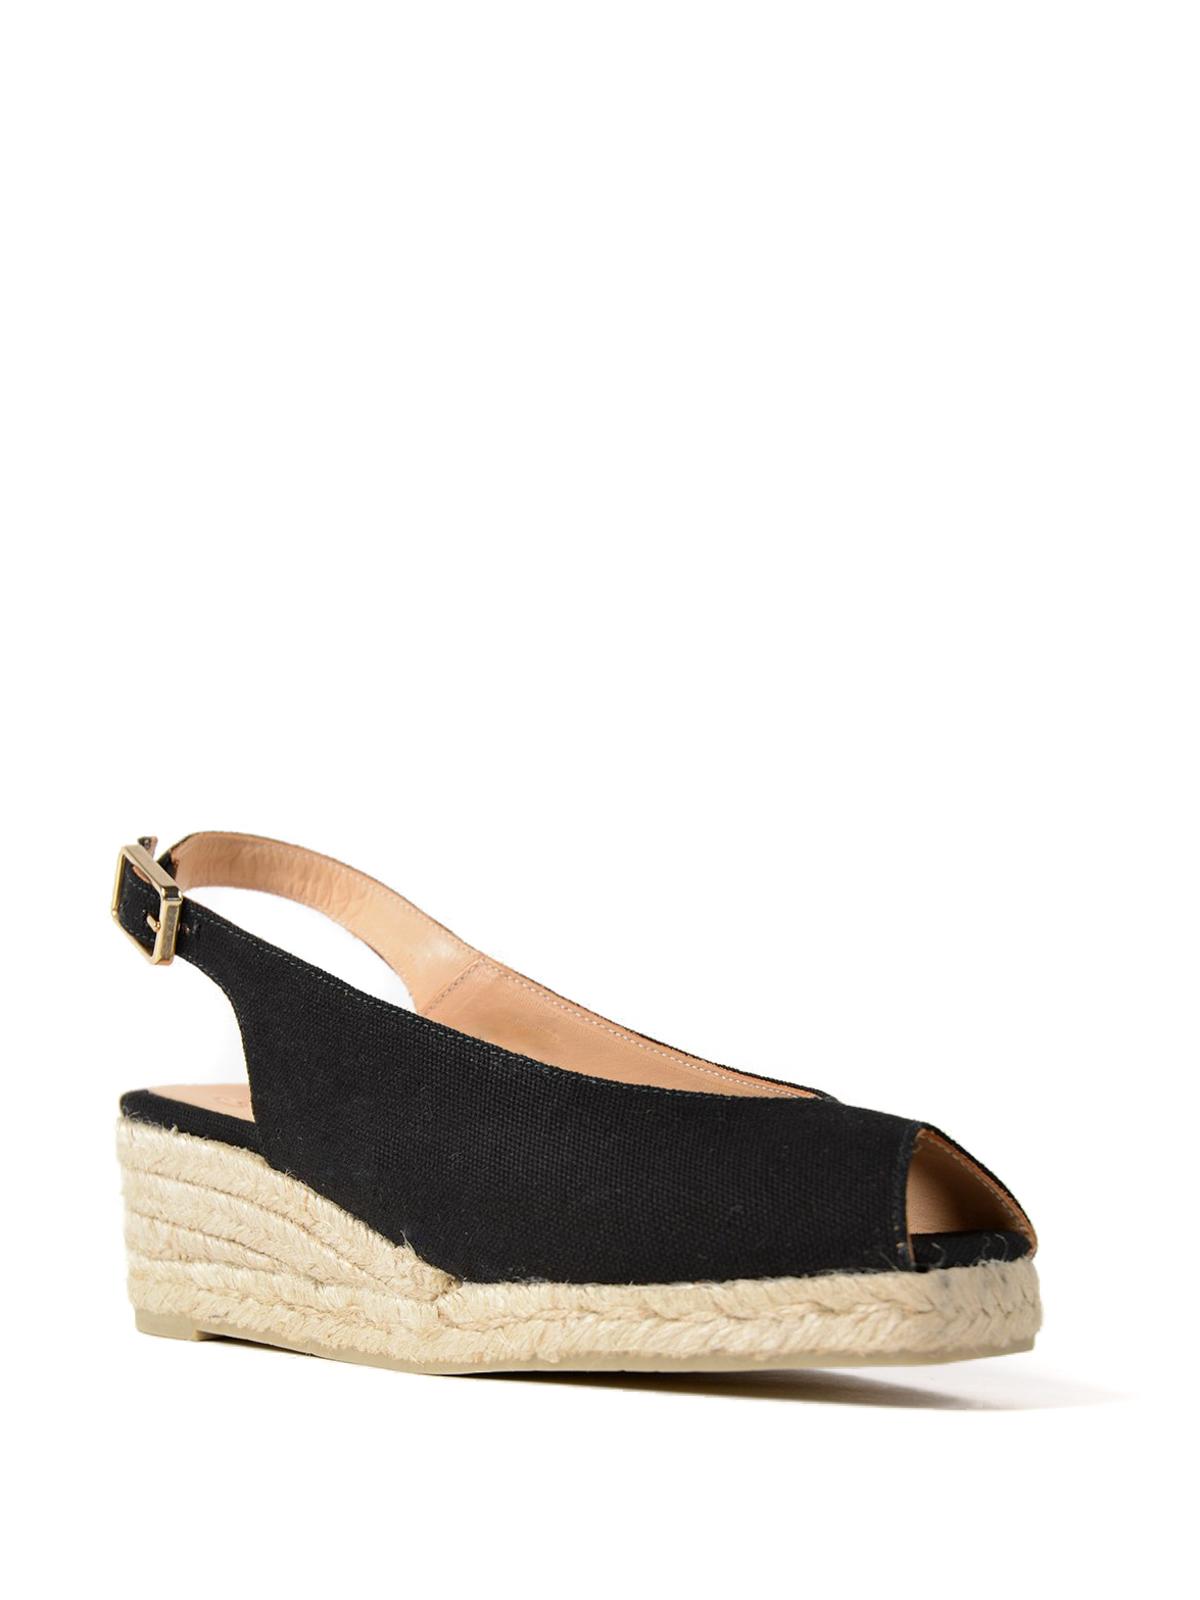 d84c2ddf2c7 CASTANER  espadrilles online - Dosalia black peep-toe espadrilles